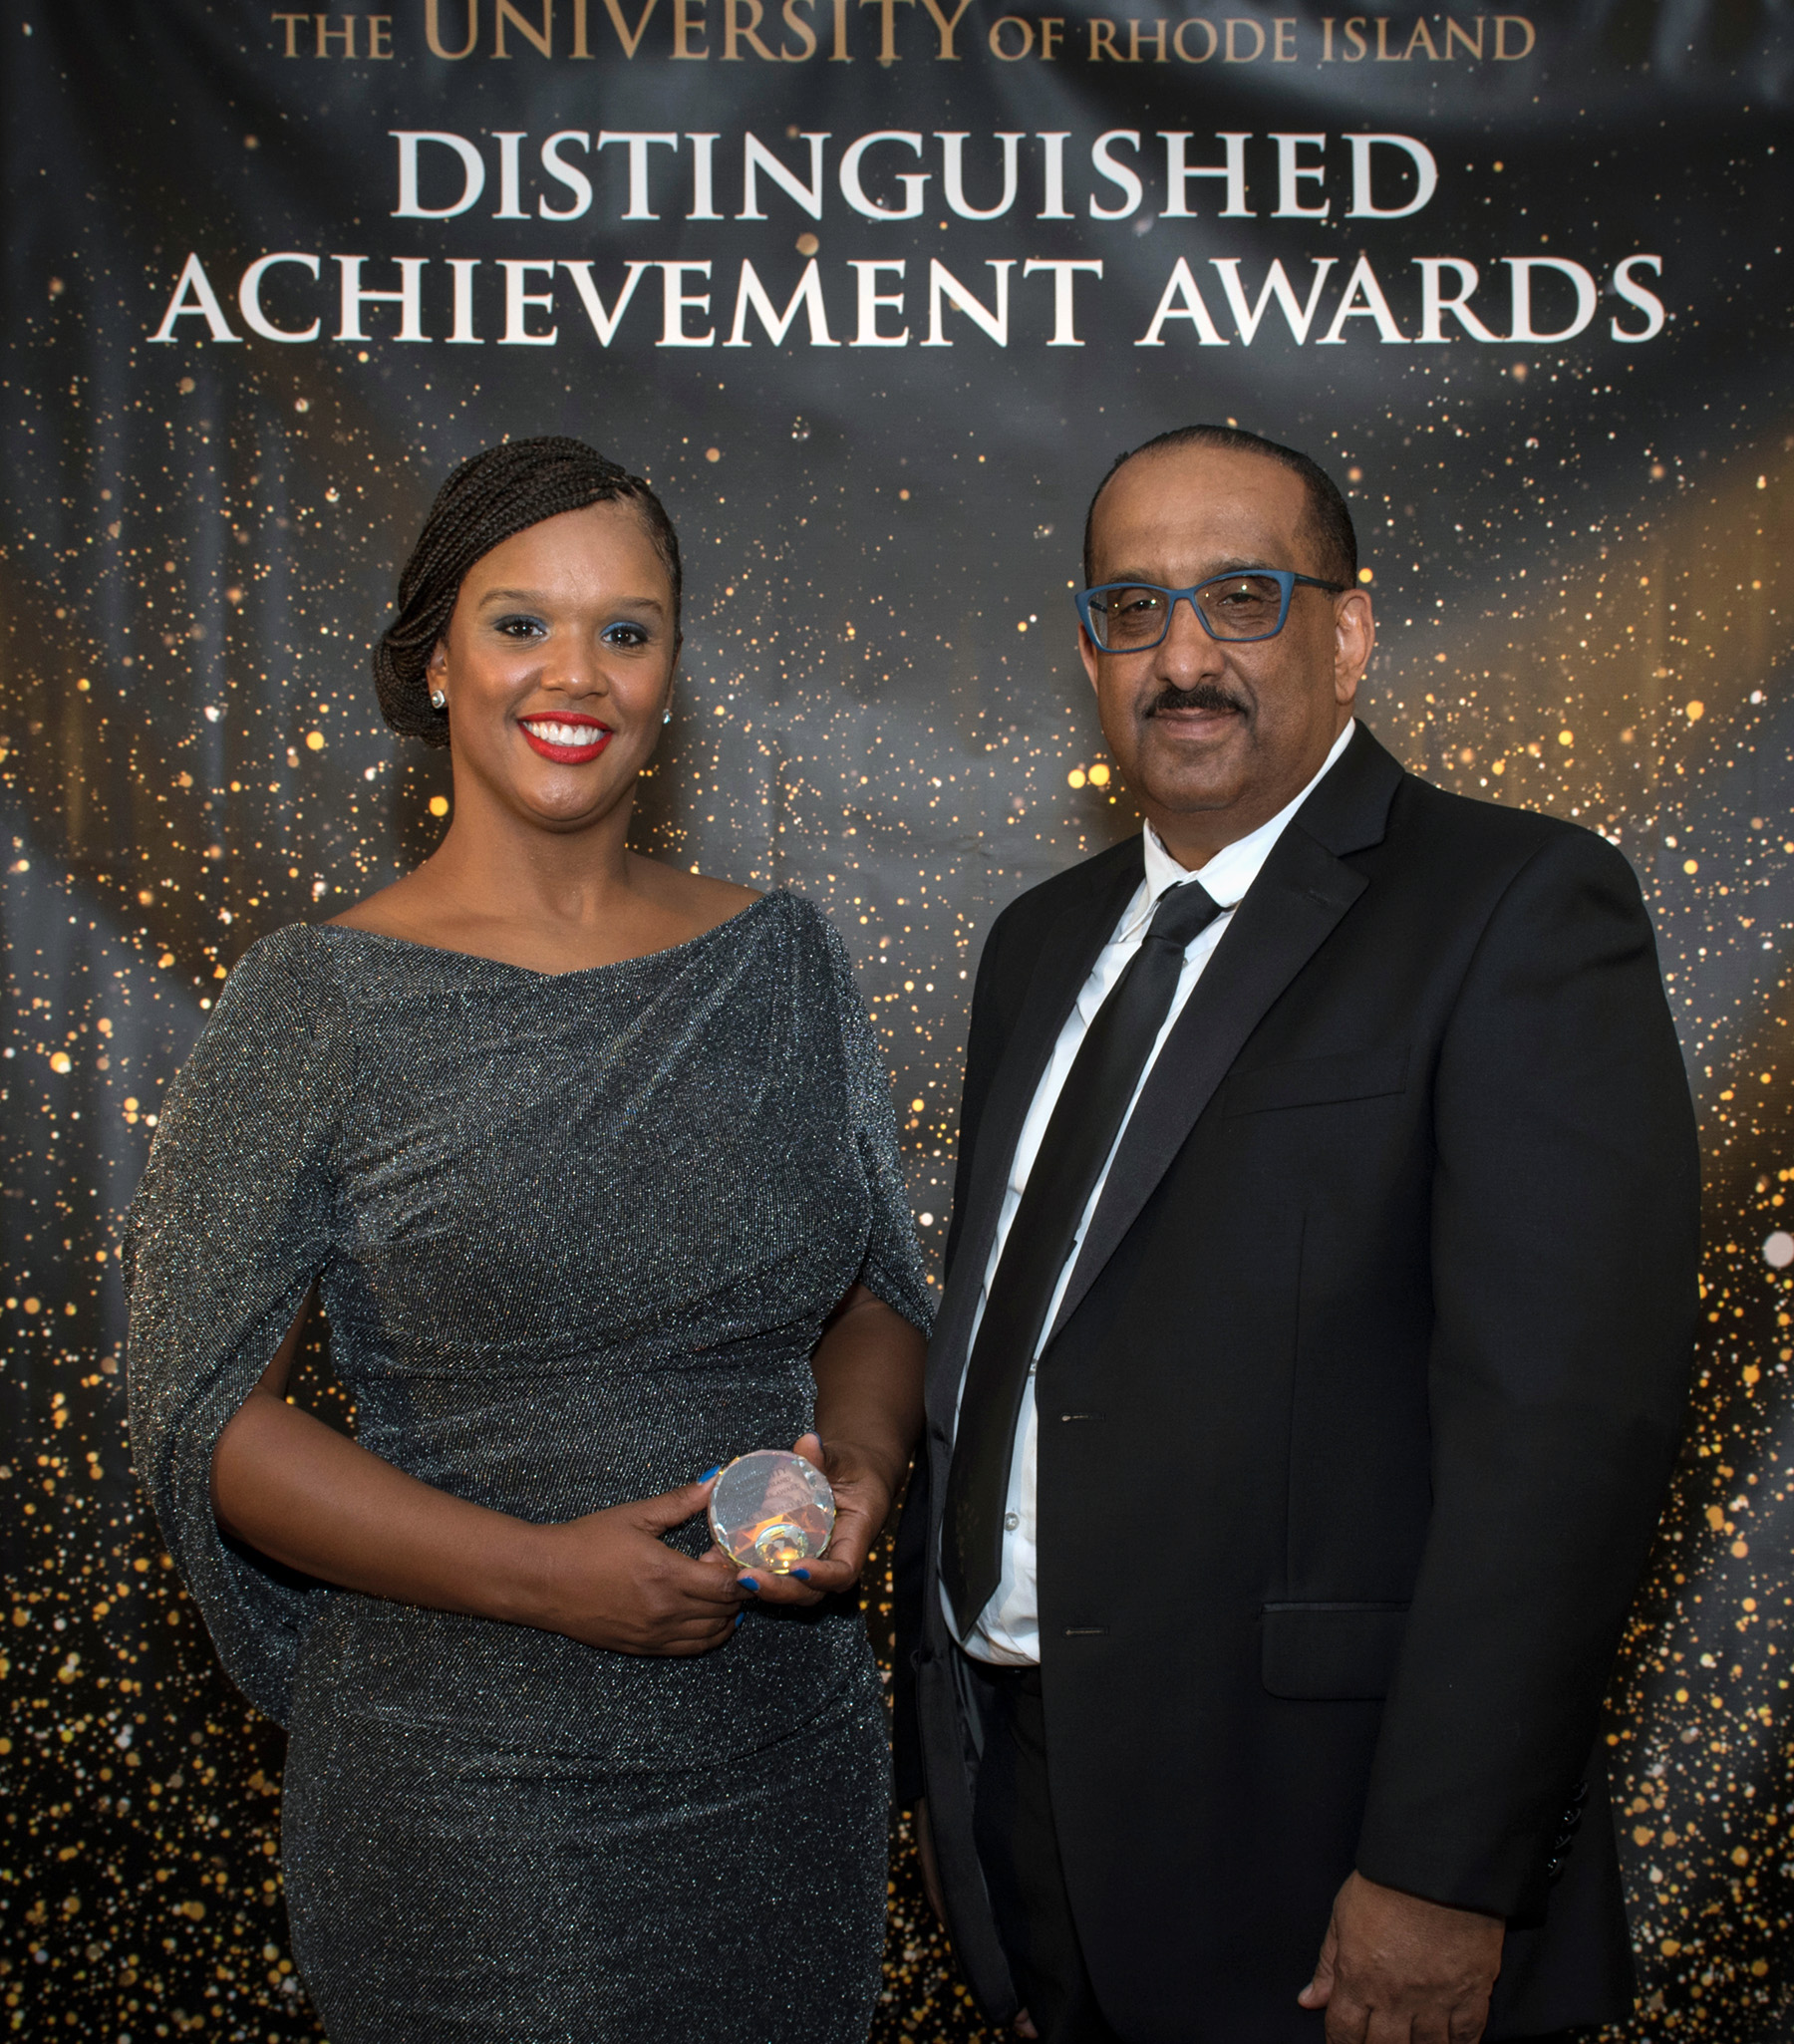 Melissa M. Husband and Nasser Zawia,